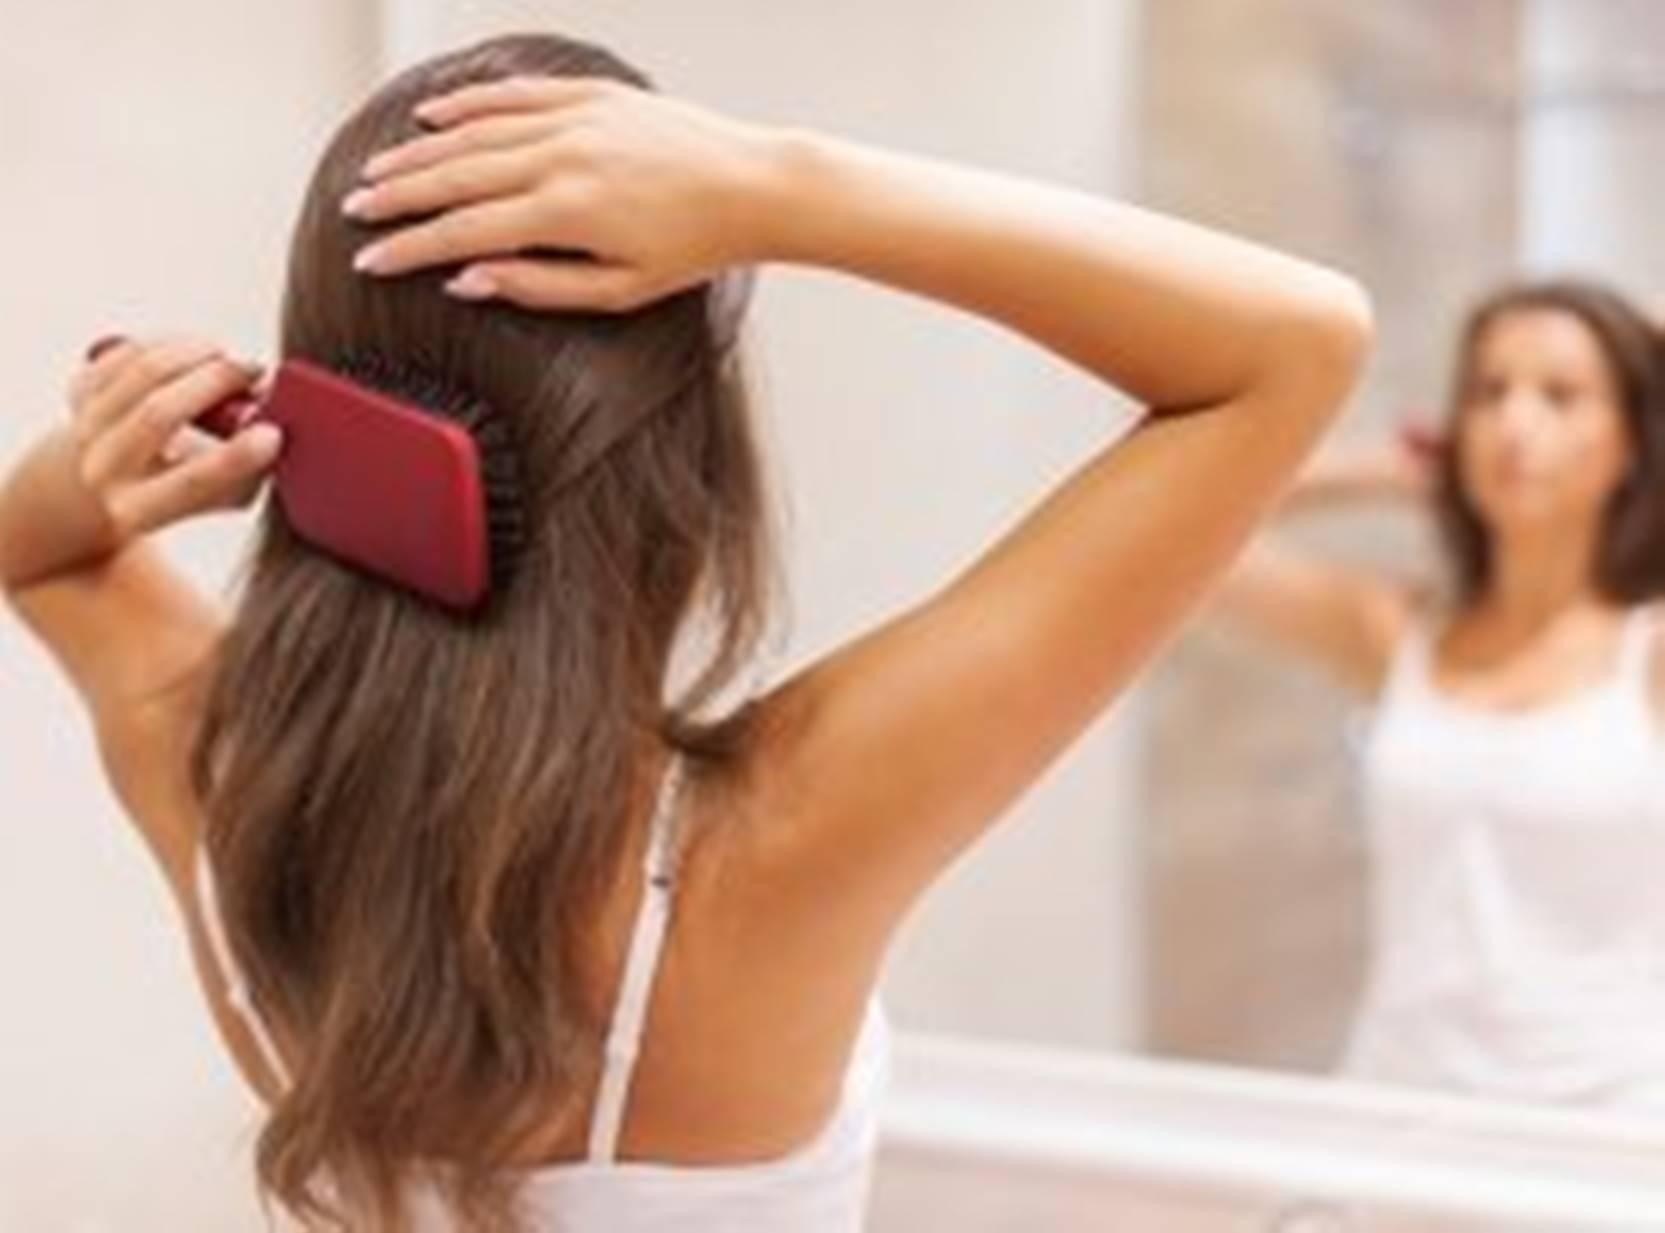 Youtuber ensina segredo que faz o cabelo crescer 40% mais rápido